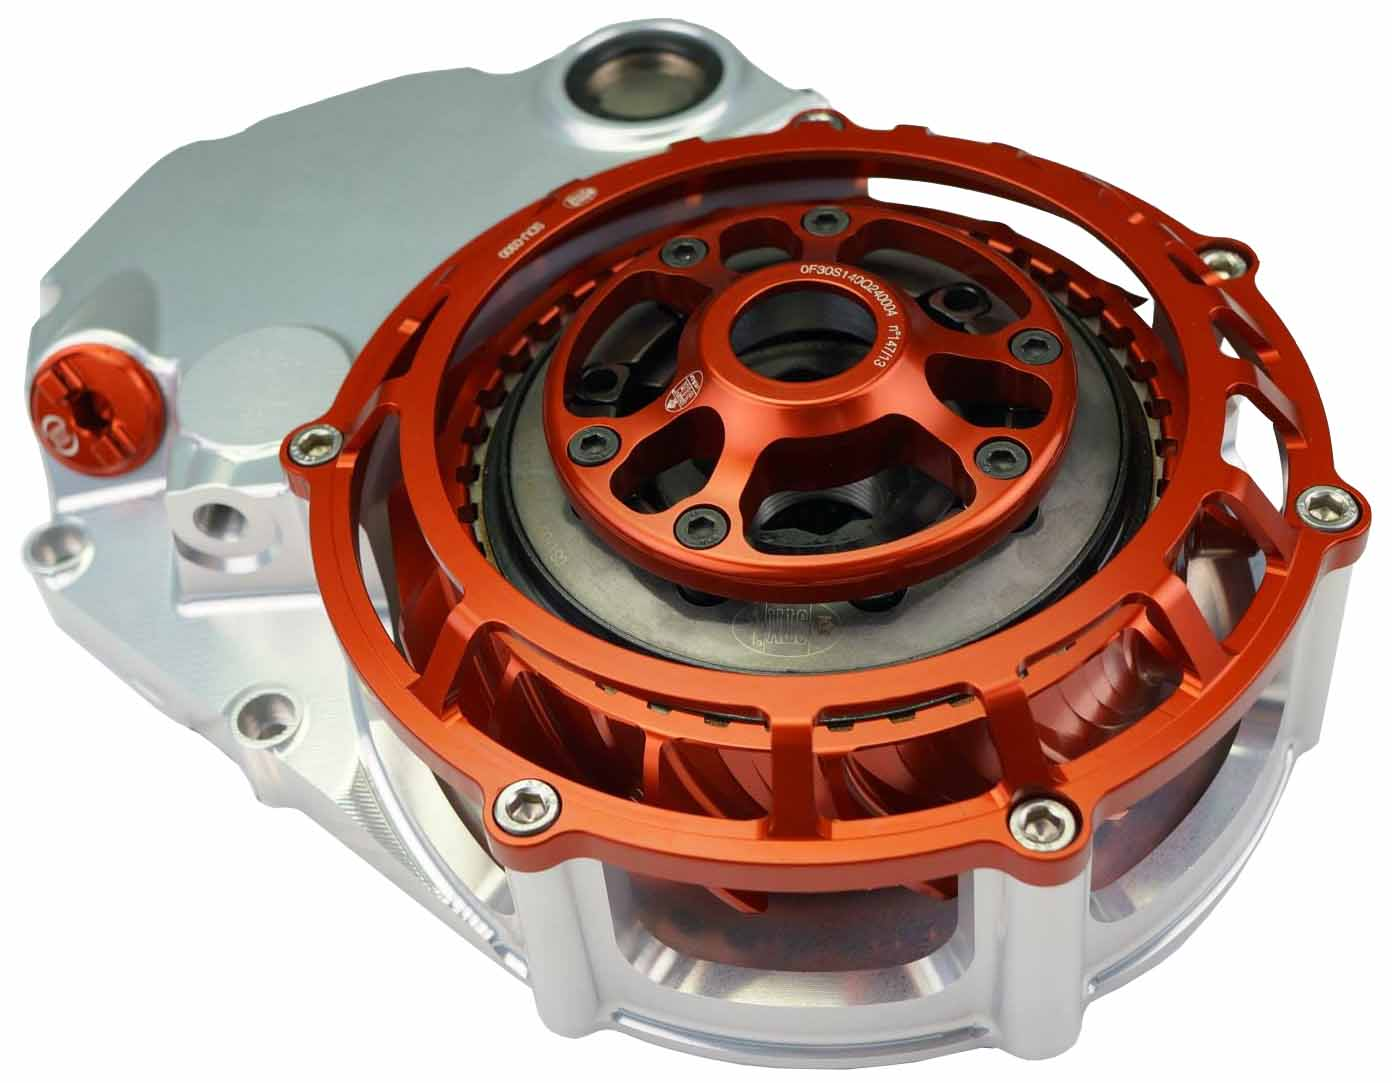 Комплект сухого сцепления STM для Ducati Diavel 11-14, Multistrada 1200 10-14